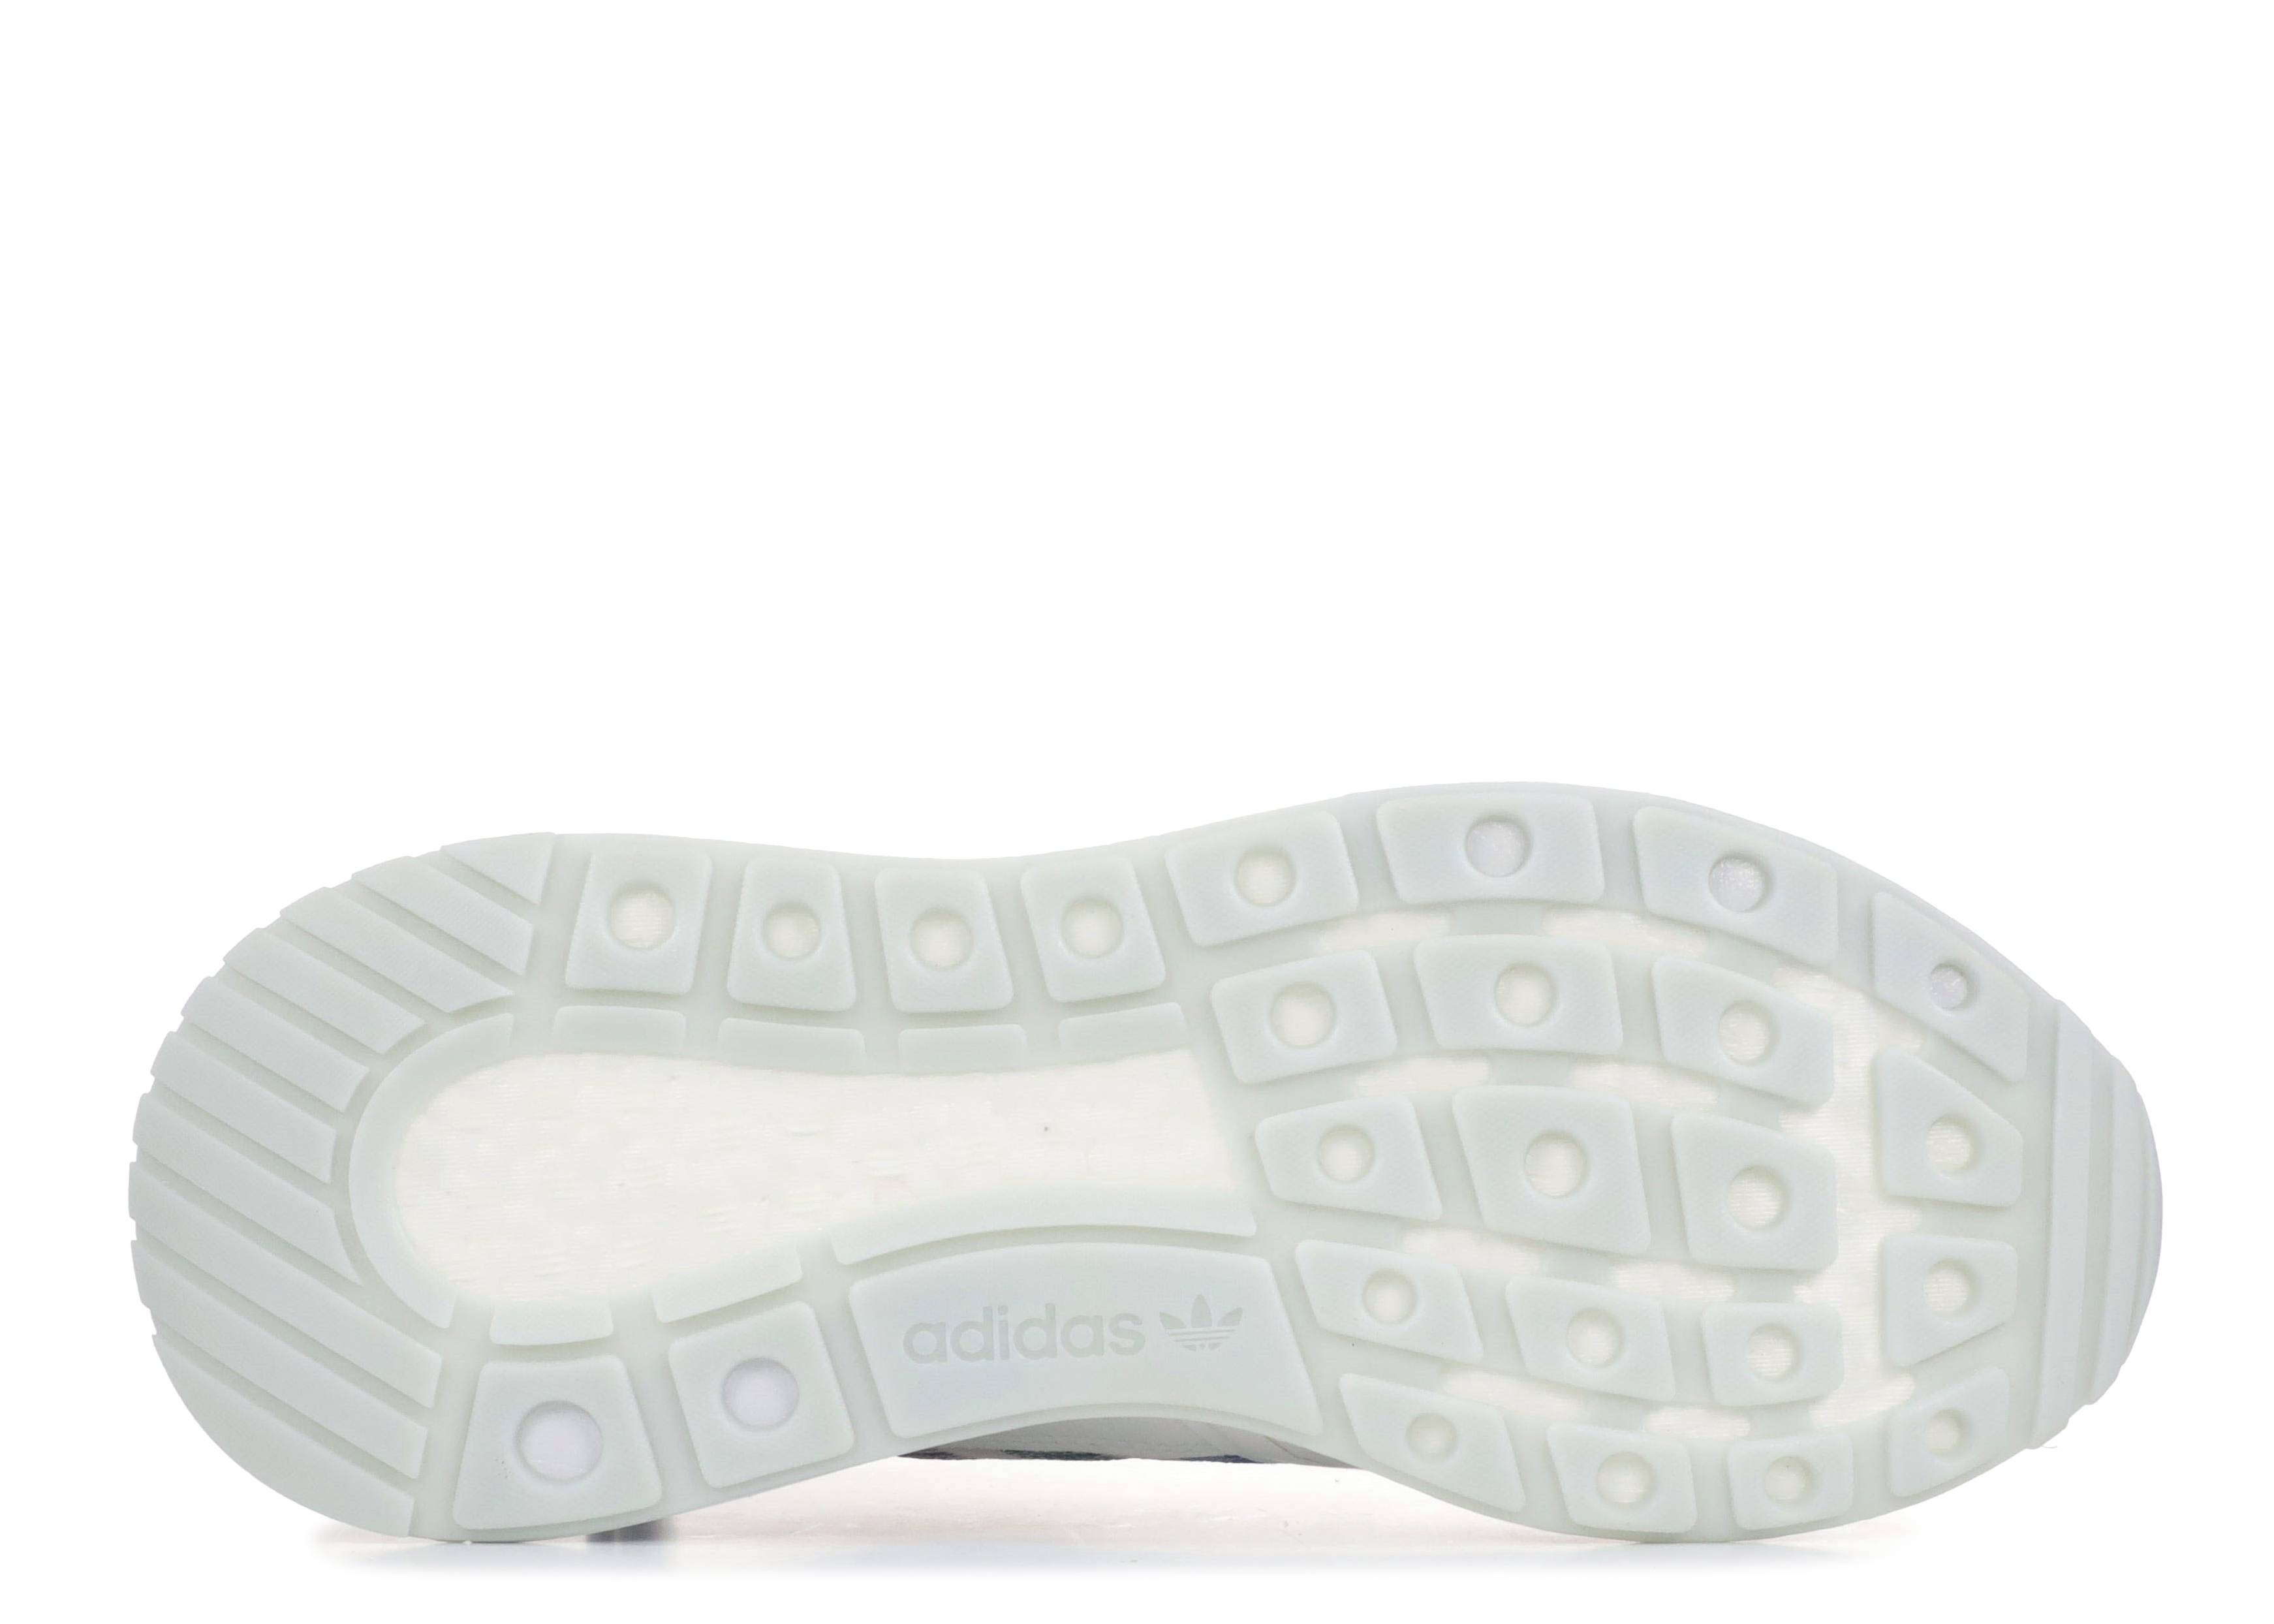 dc051cb3e423b Zx 500 Rm Commonwealth - Adidas - db3510 - white white-white ...